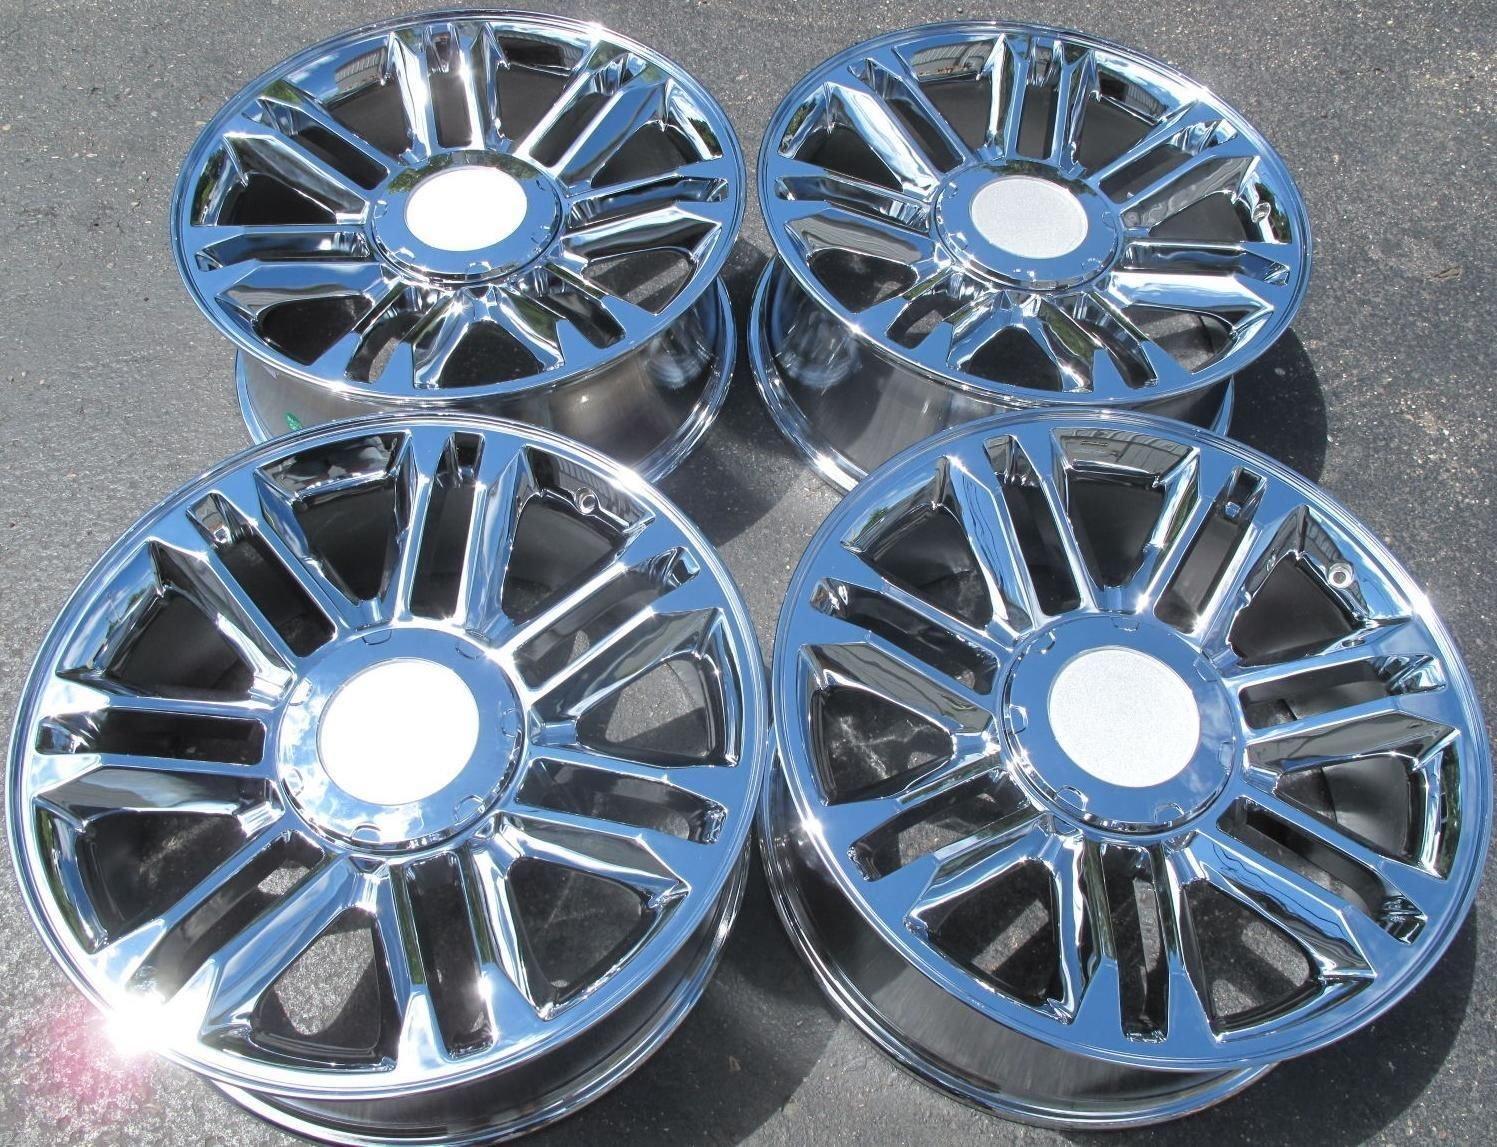 yukon sierra of chevy gmc rims chrome wheels cadillac for set p